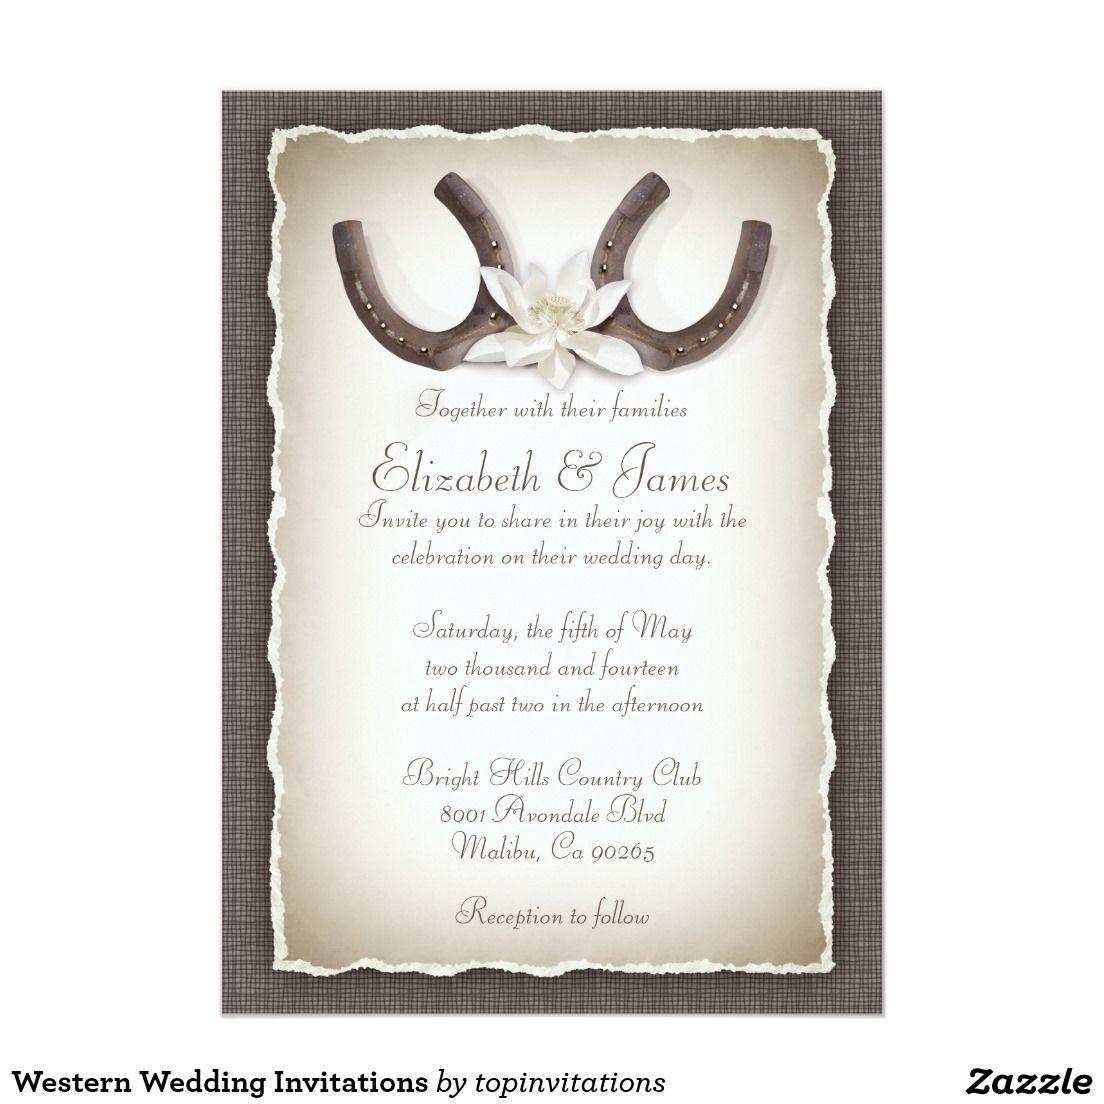 Western Wedding Invitations   Western invitations, Wedding and ...